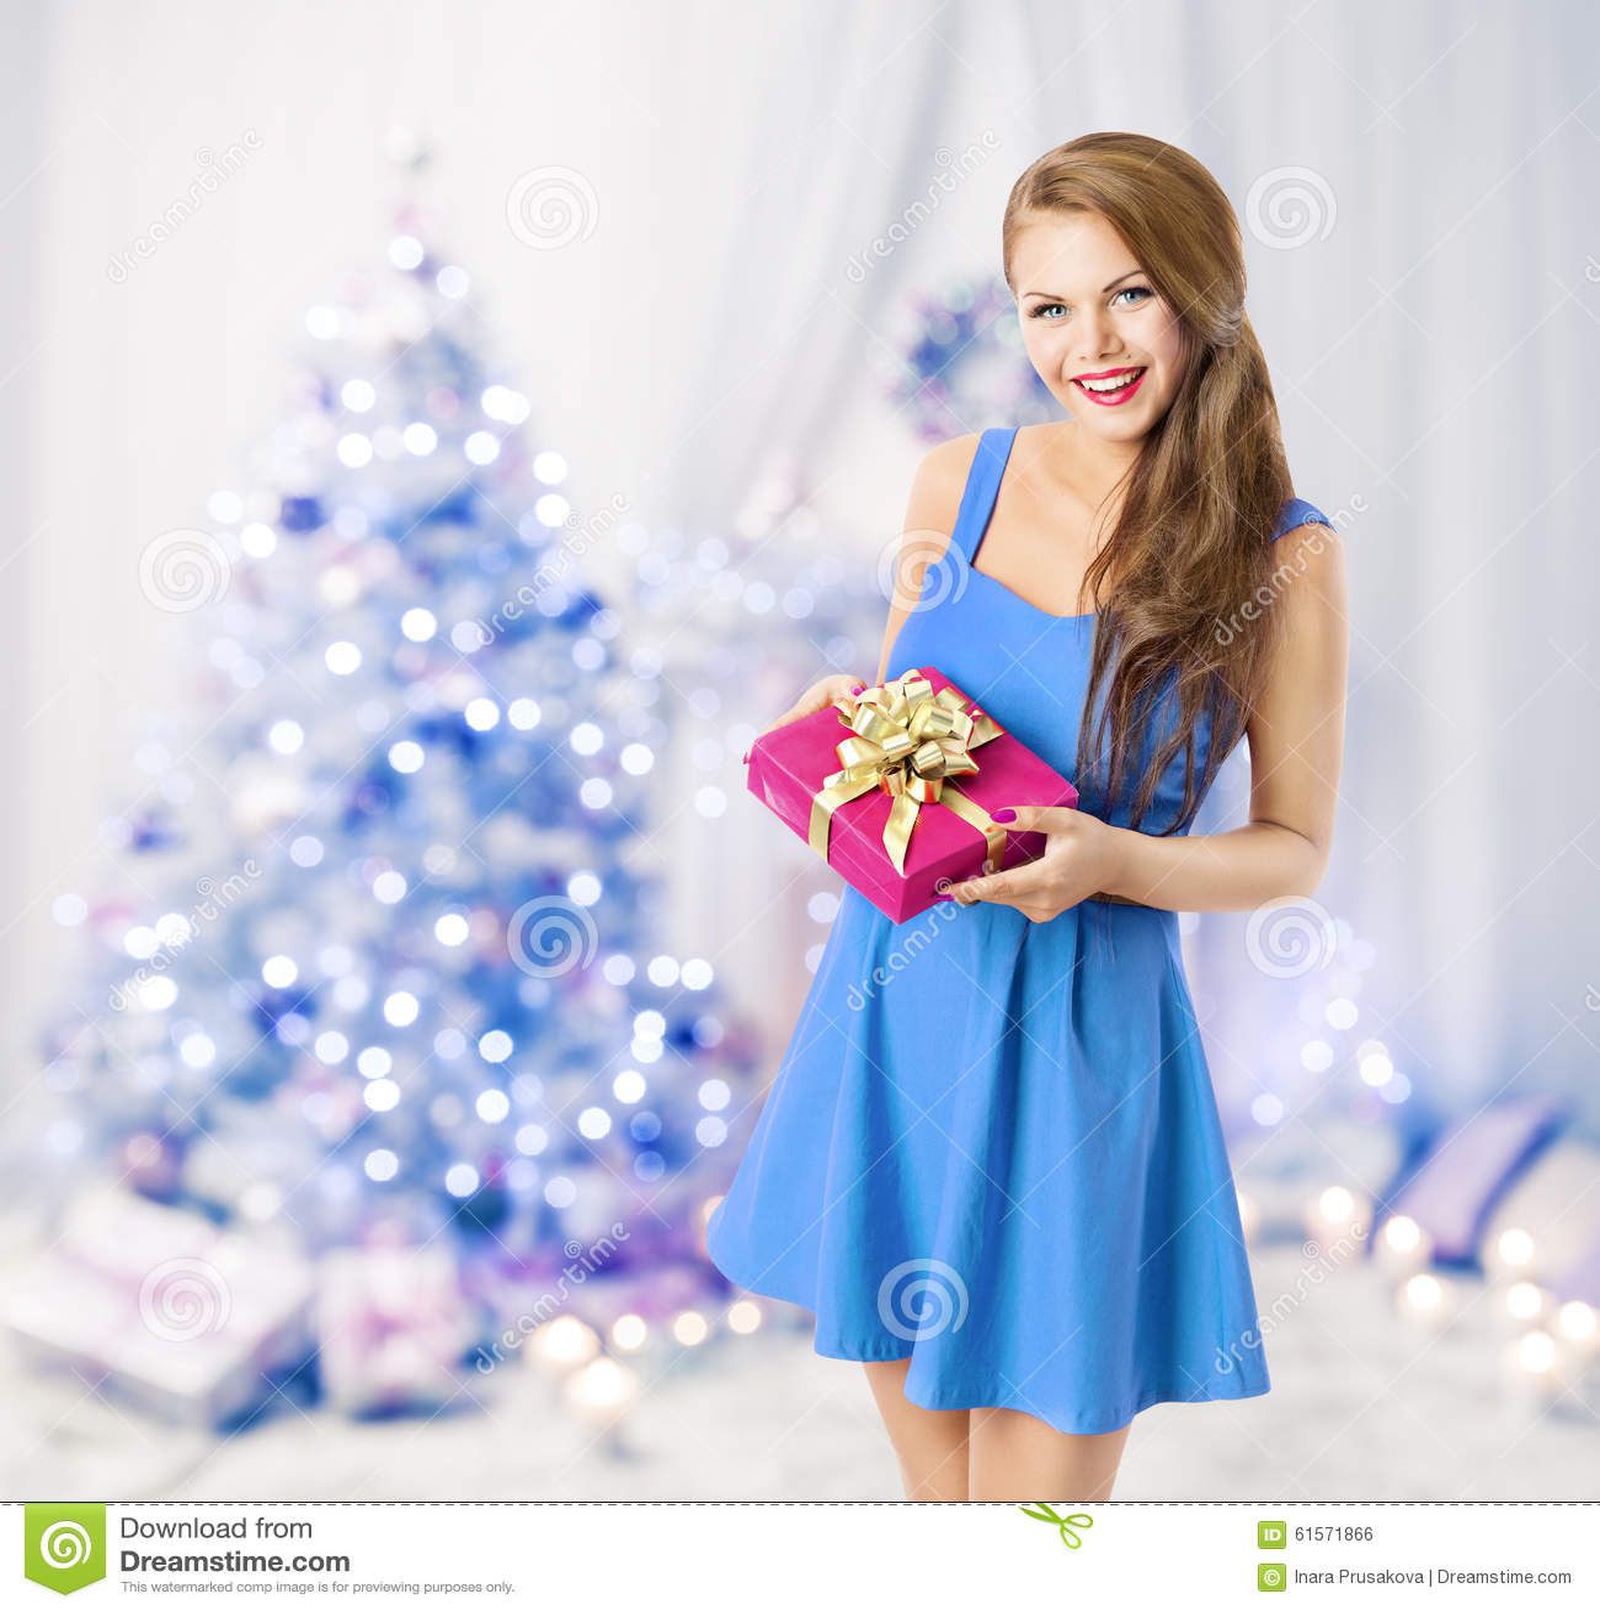 Woman Holding Christmas Present Gift Box, Model Girl, Blue Tree